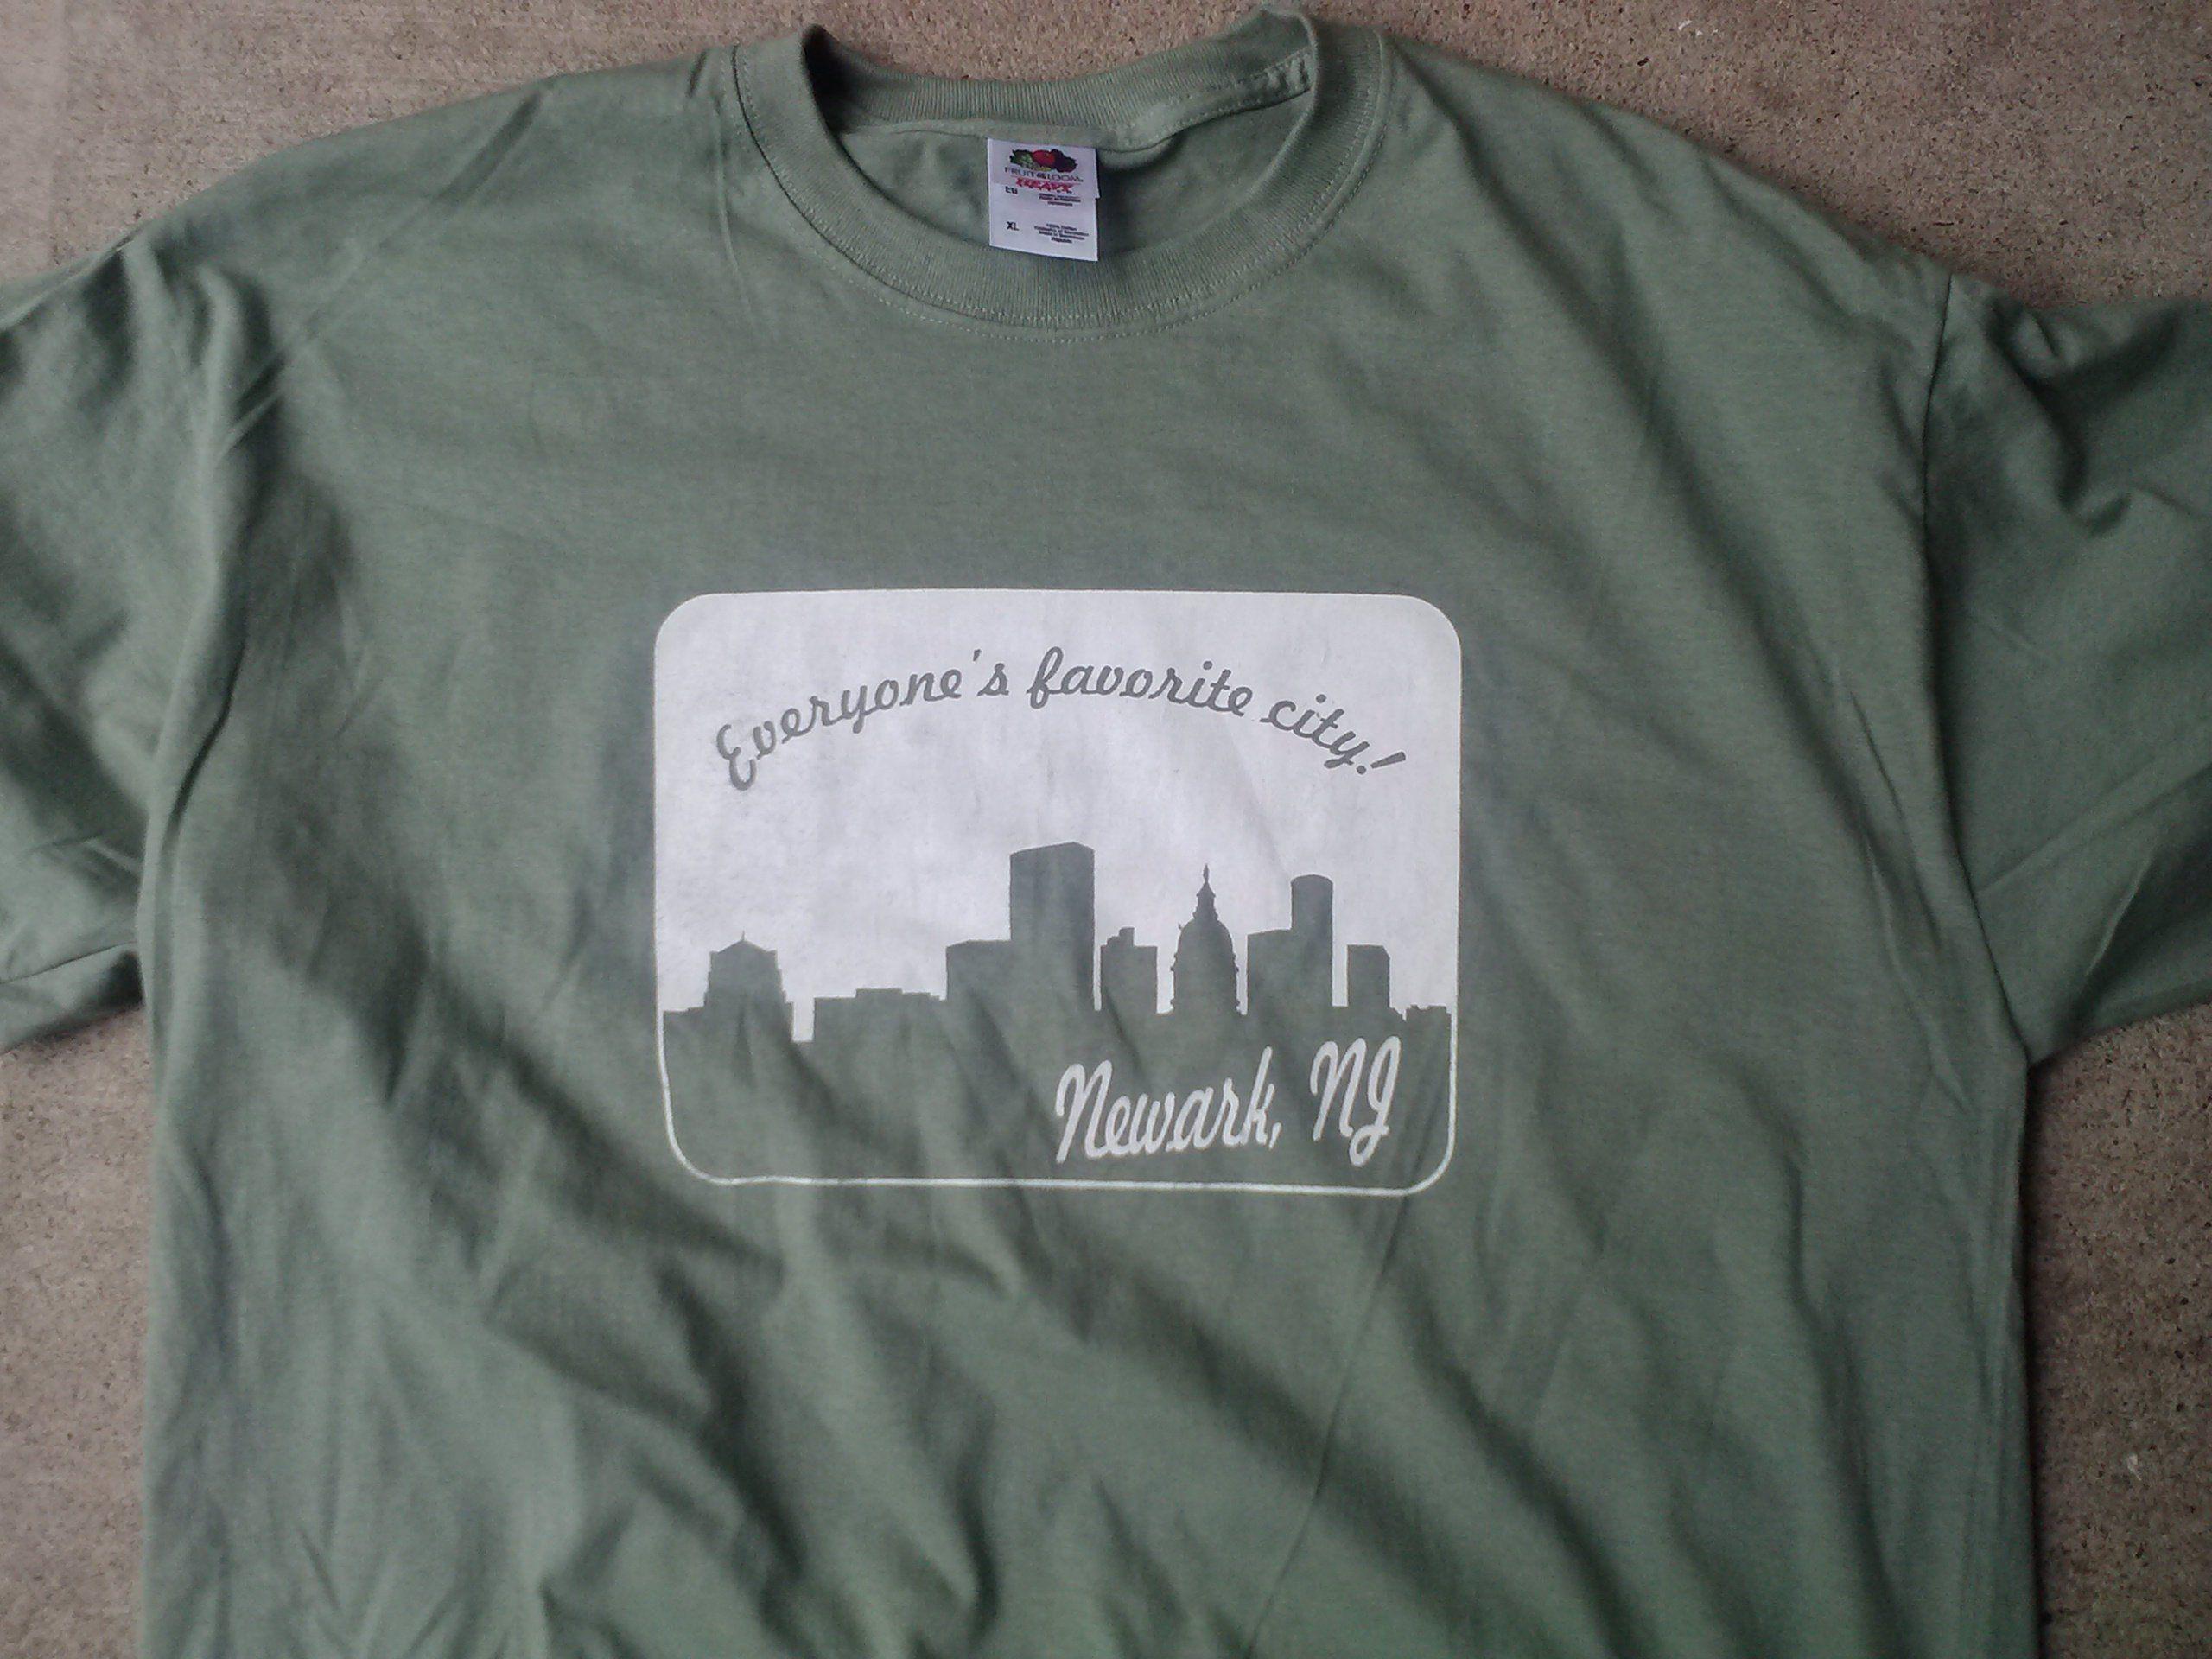 Newark NJ everyone's favorite city vintage style tee shirt